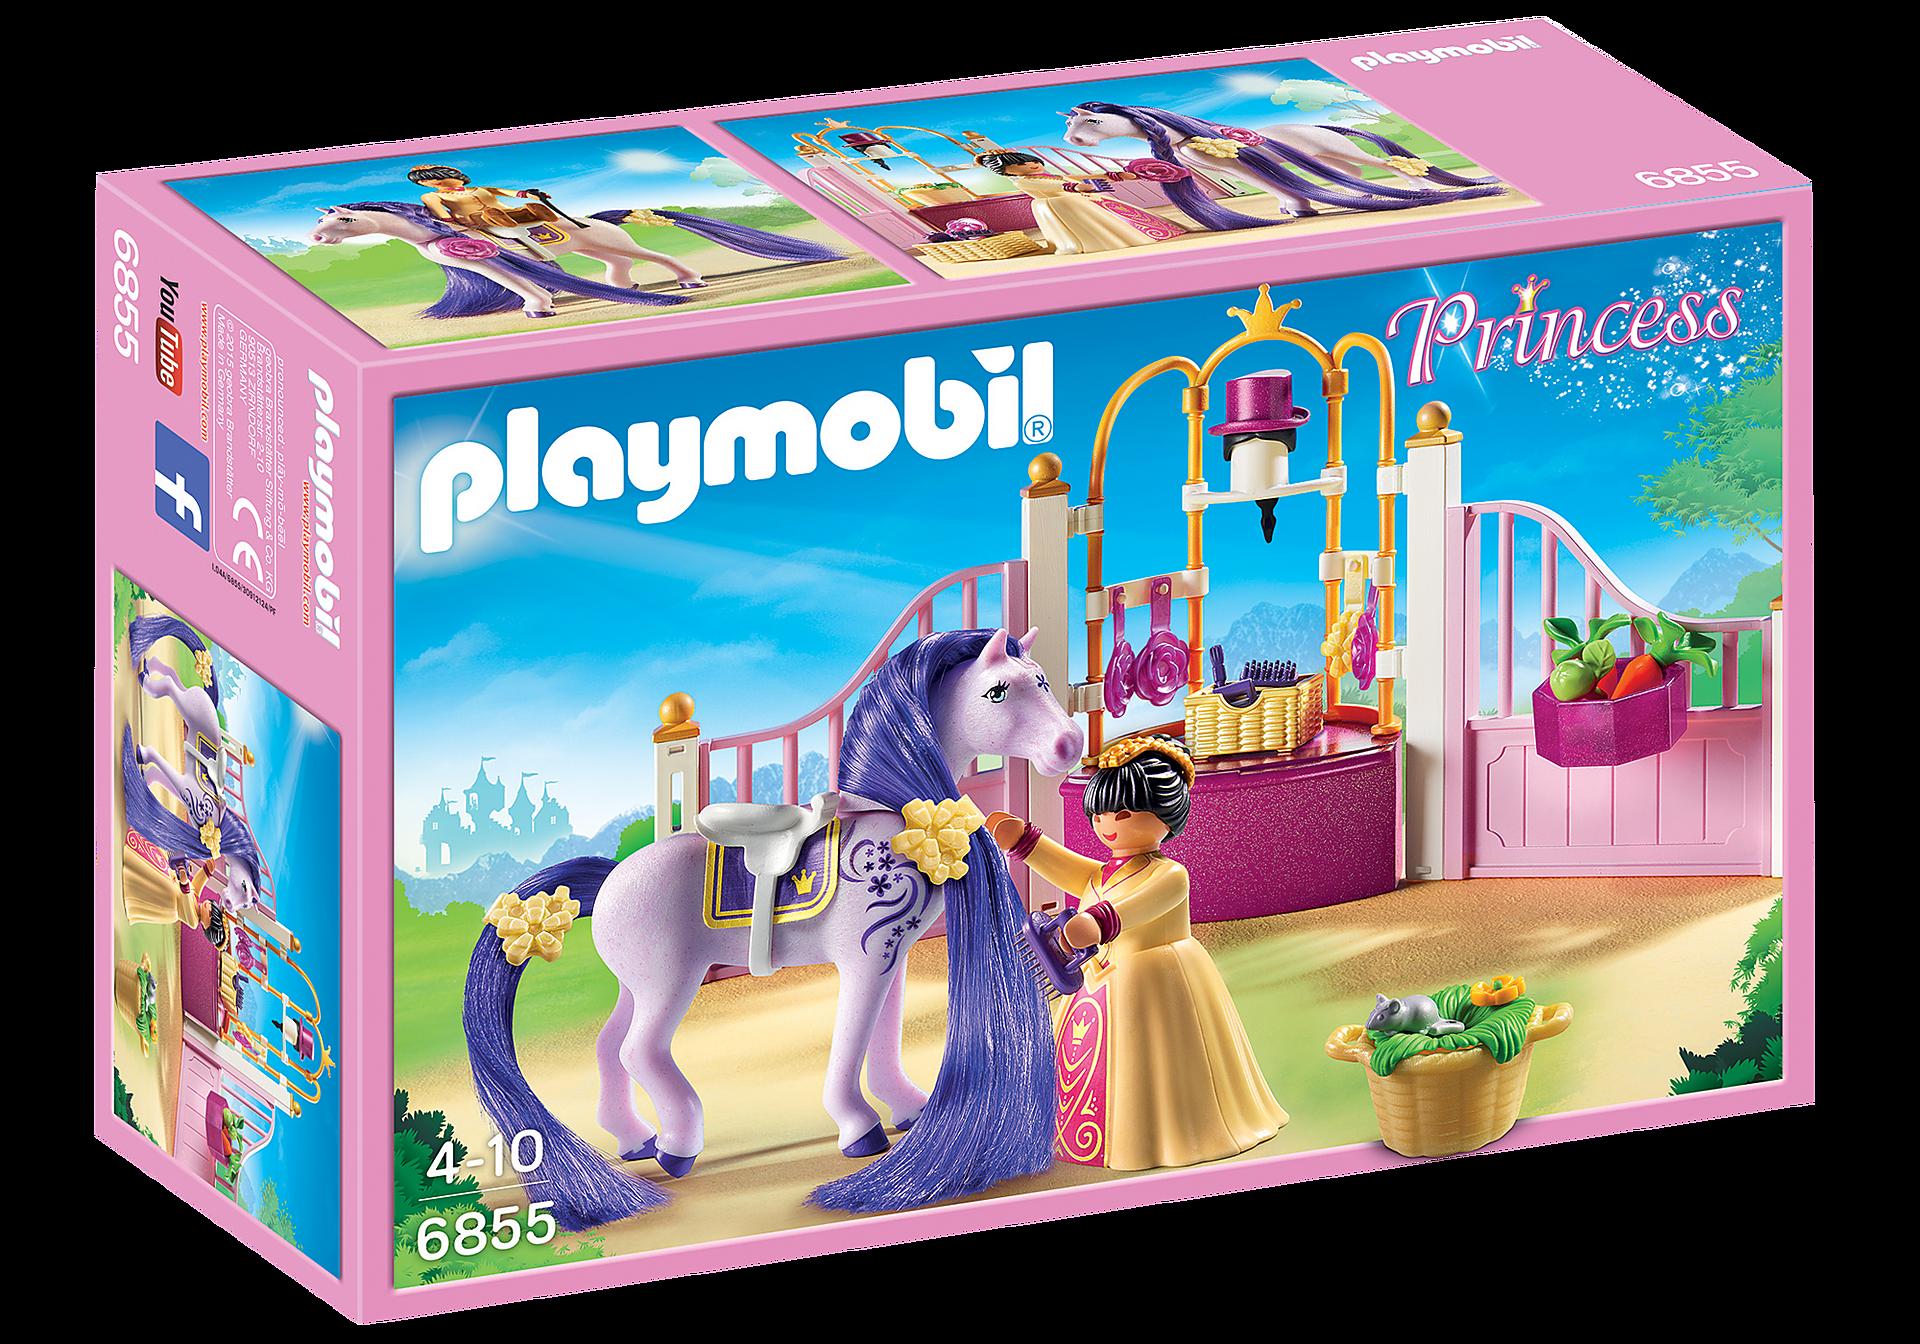 http://media.playmobil.com/i/playmobil/6855_product_box_front/Замок Принцессы: Королевская конюшня